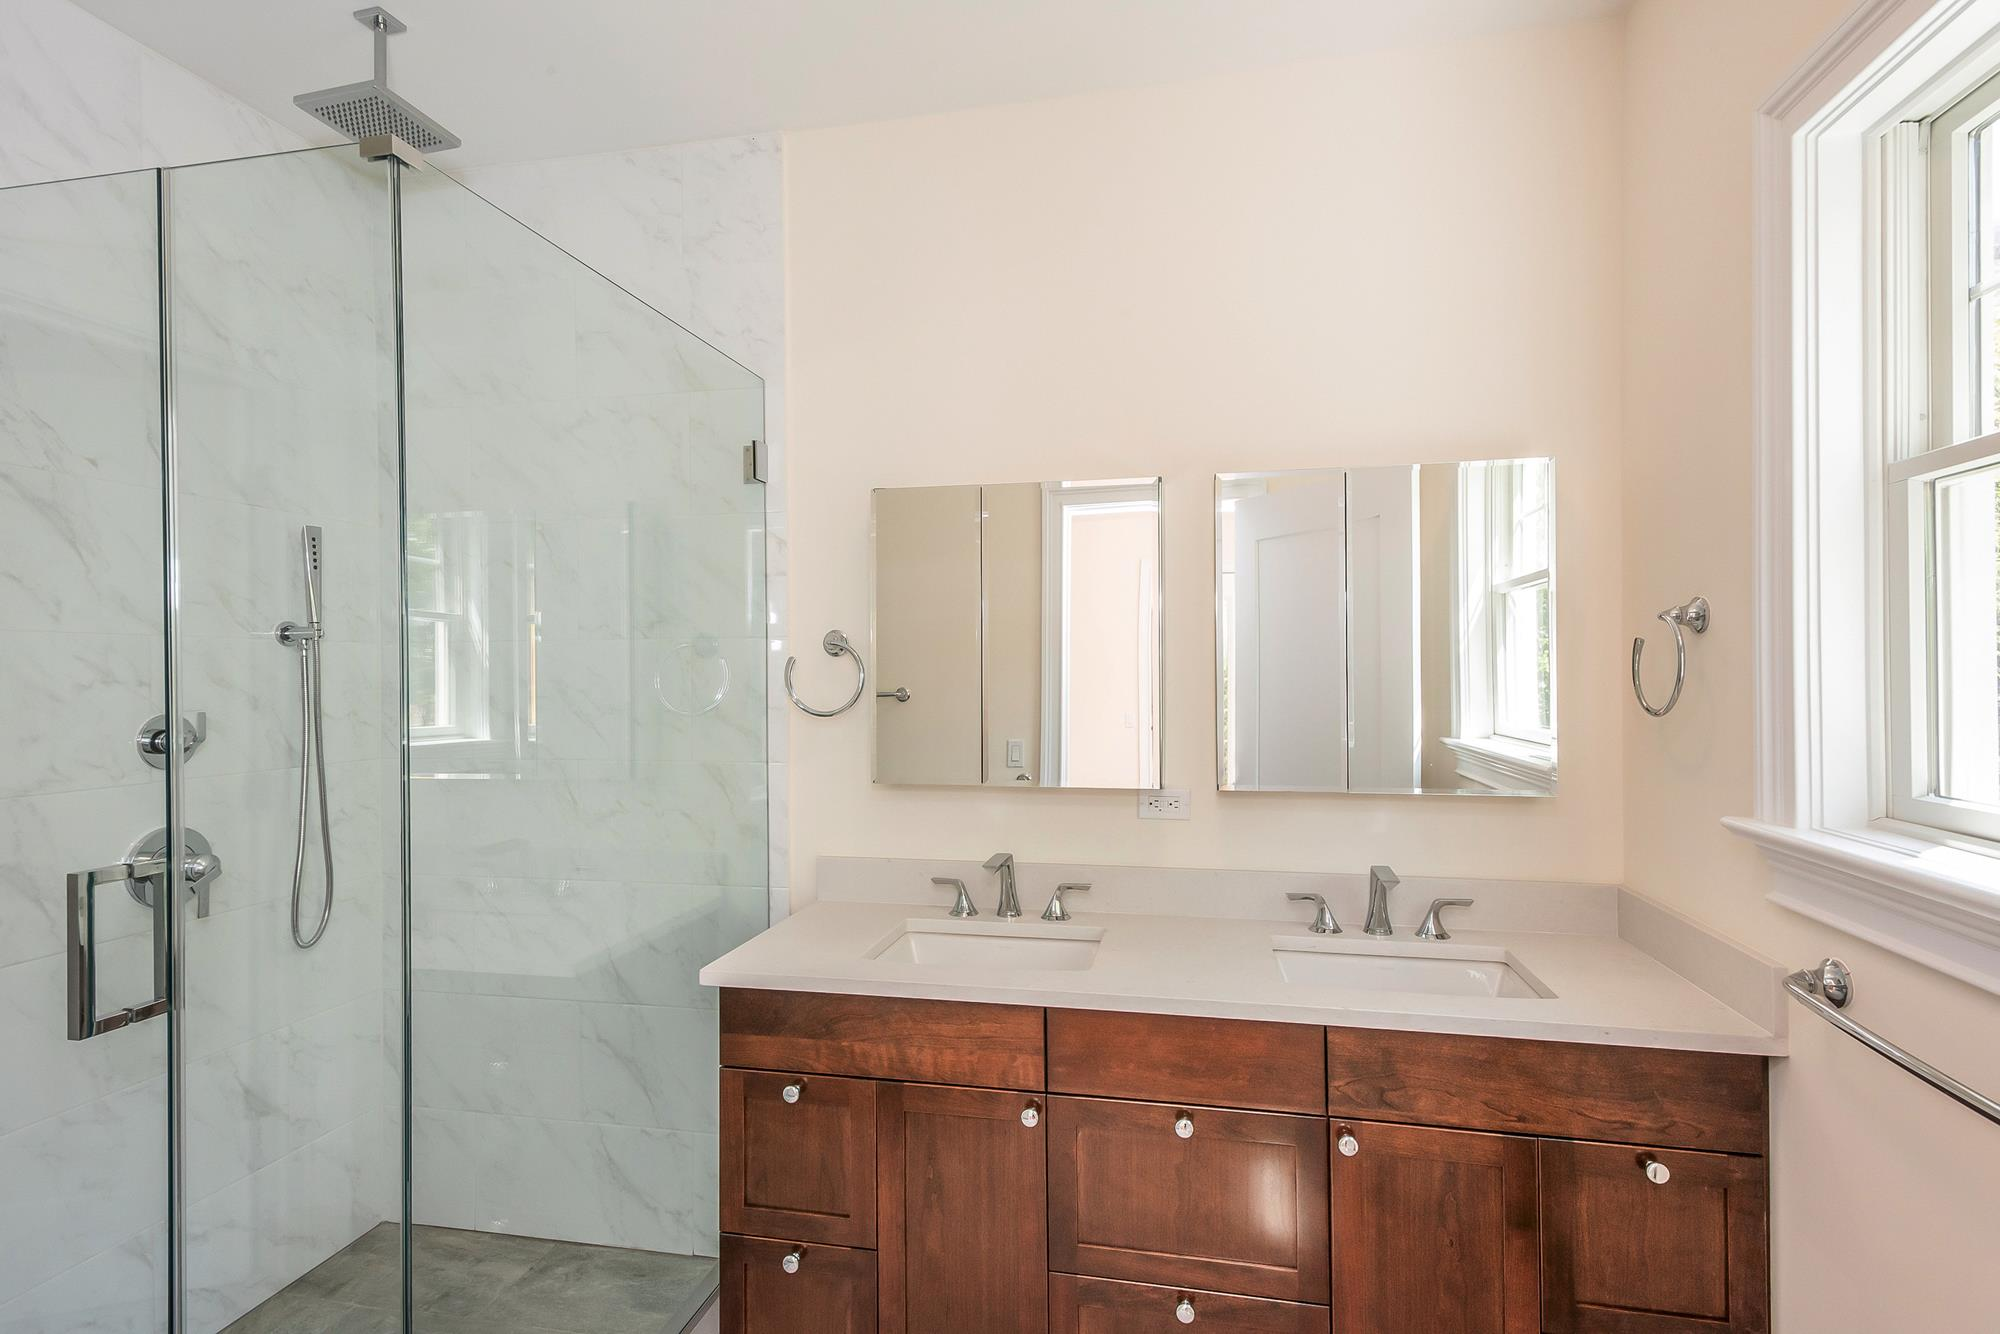 ESTATE AREA: Newly Built 7-Bd. House w/ Patios, Roof Terraces & Grassy Yard at 4611 Arlington Avenue